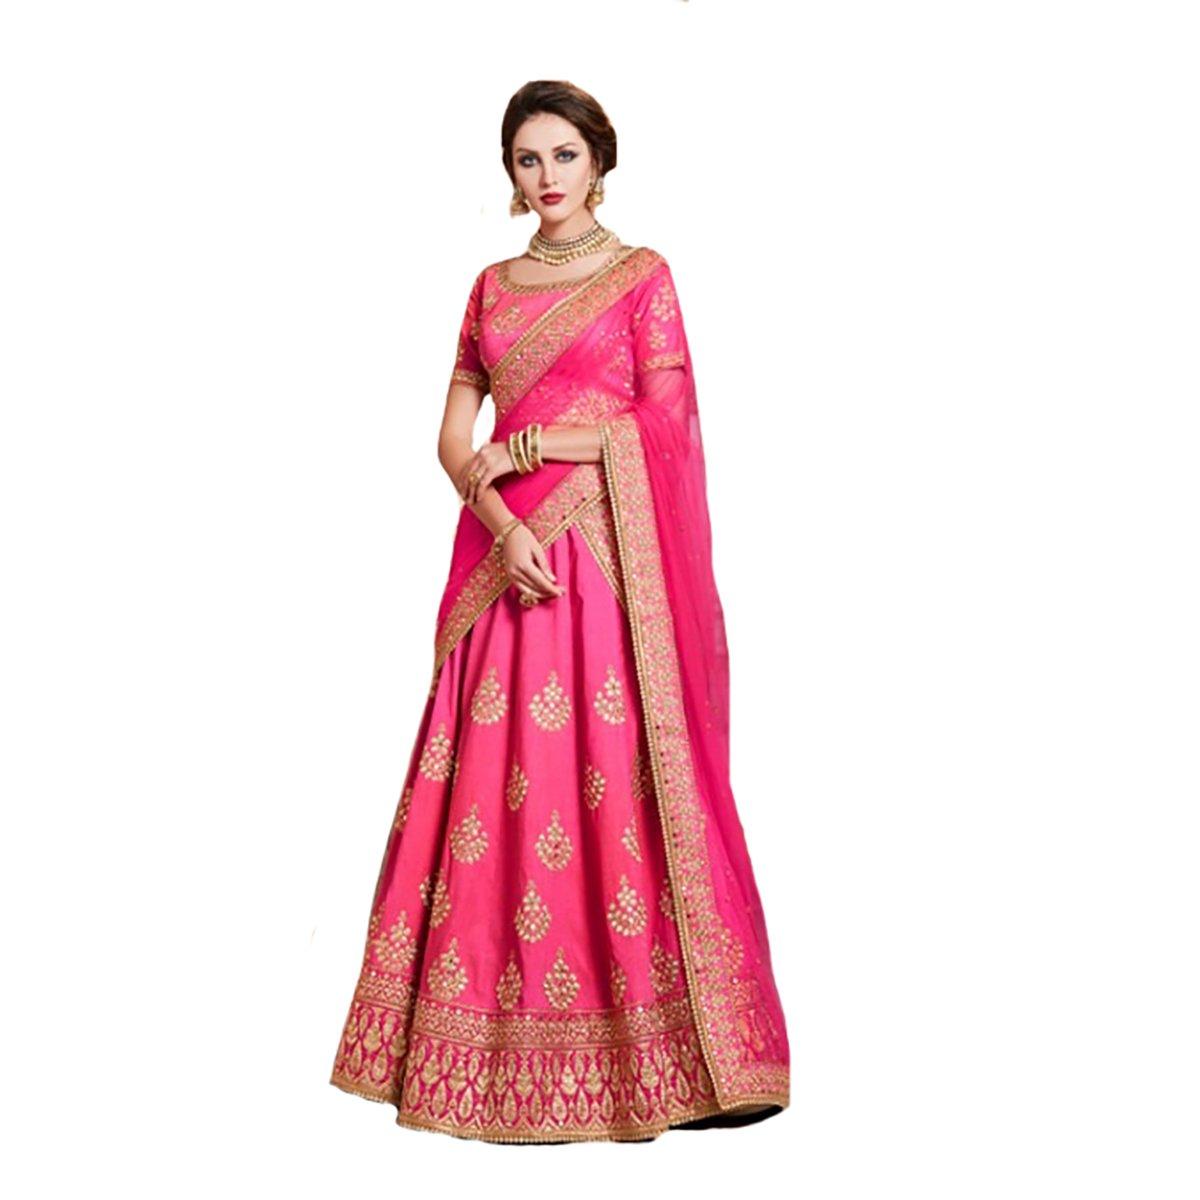 Wedding Indian Muslim Festival Women Dress Hijab Straight Lehenga Choli Salwar Kameez Suit Party Wea...